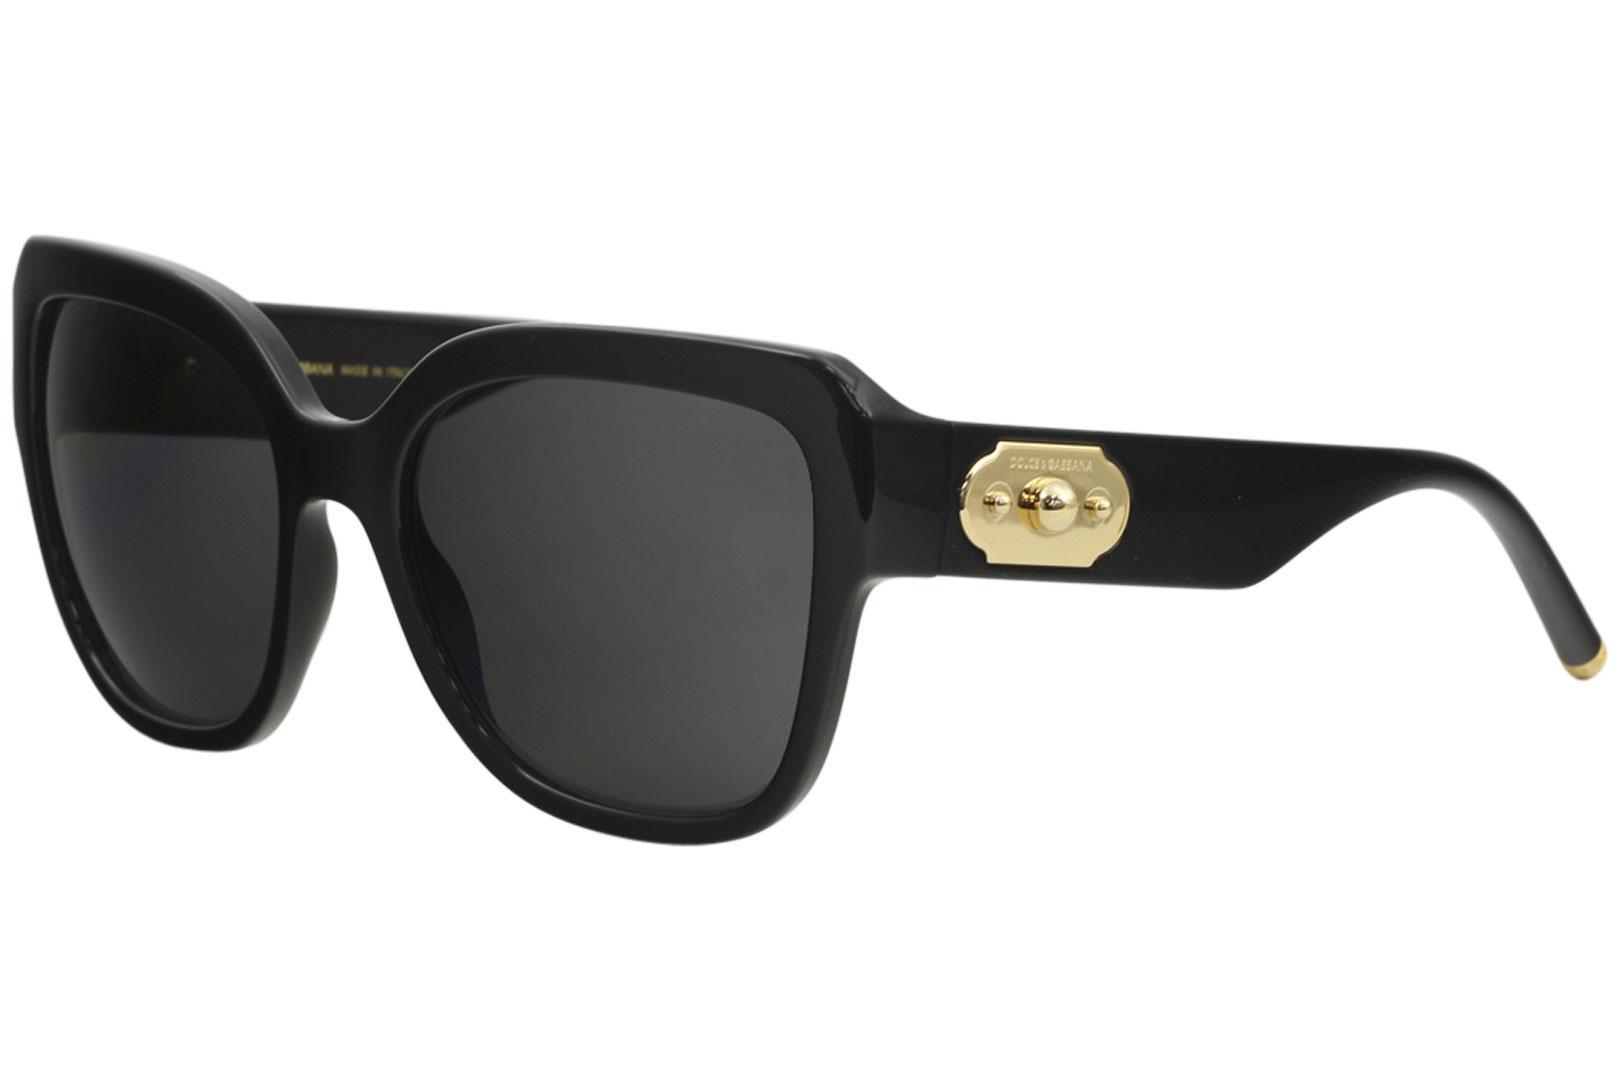 3ccad6ba0981 Dolce   Gabbana Women s D G DG6118 DG 6118 Fashion Square Sunglasses by  Dolce   Gabbana